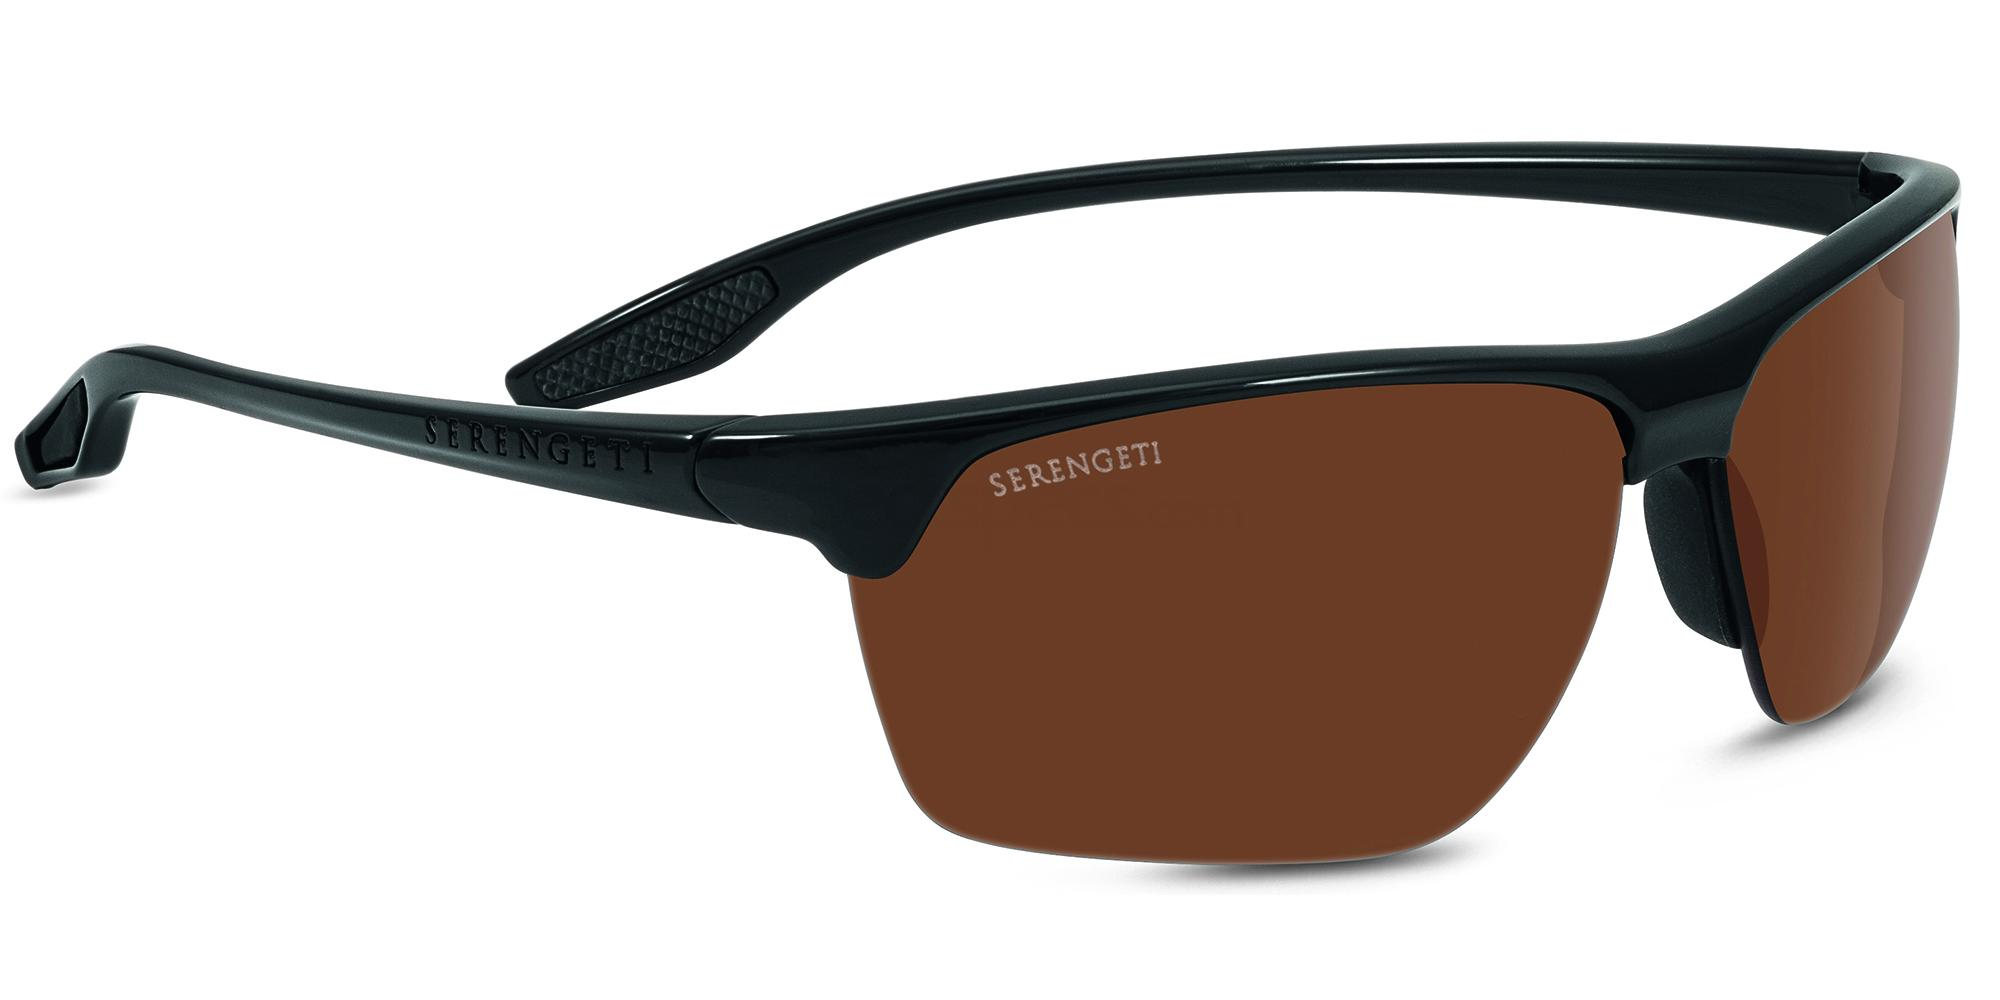 8505 Sport LINOSA Sunglasses, Serengeti